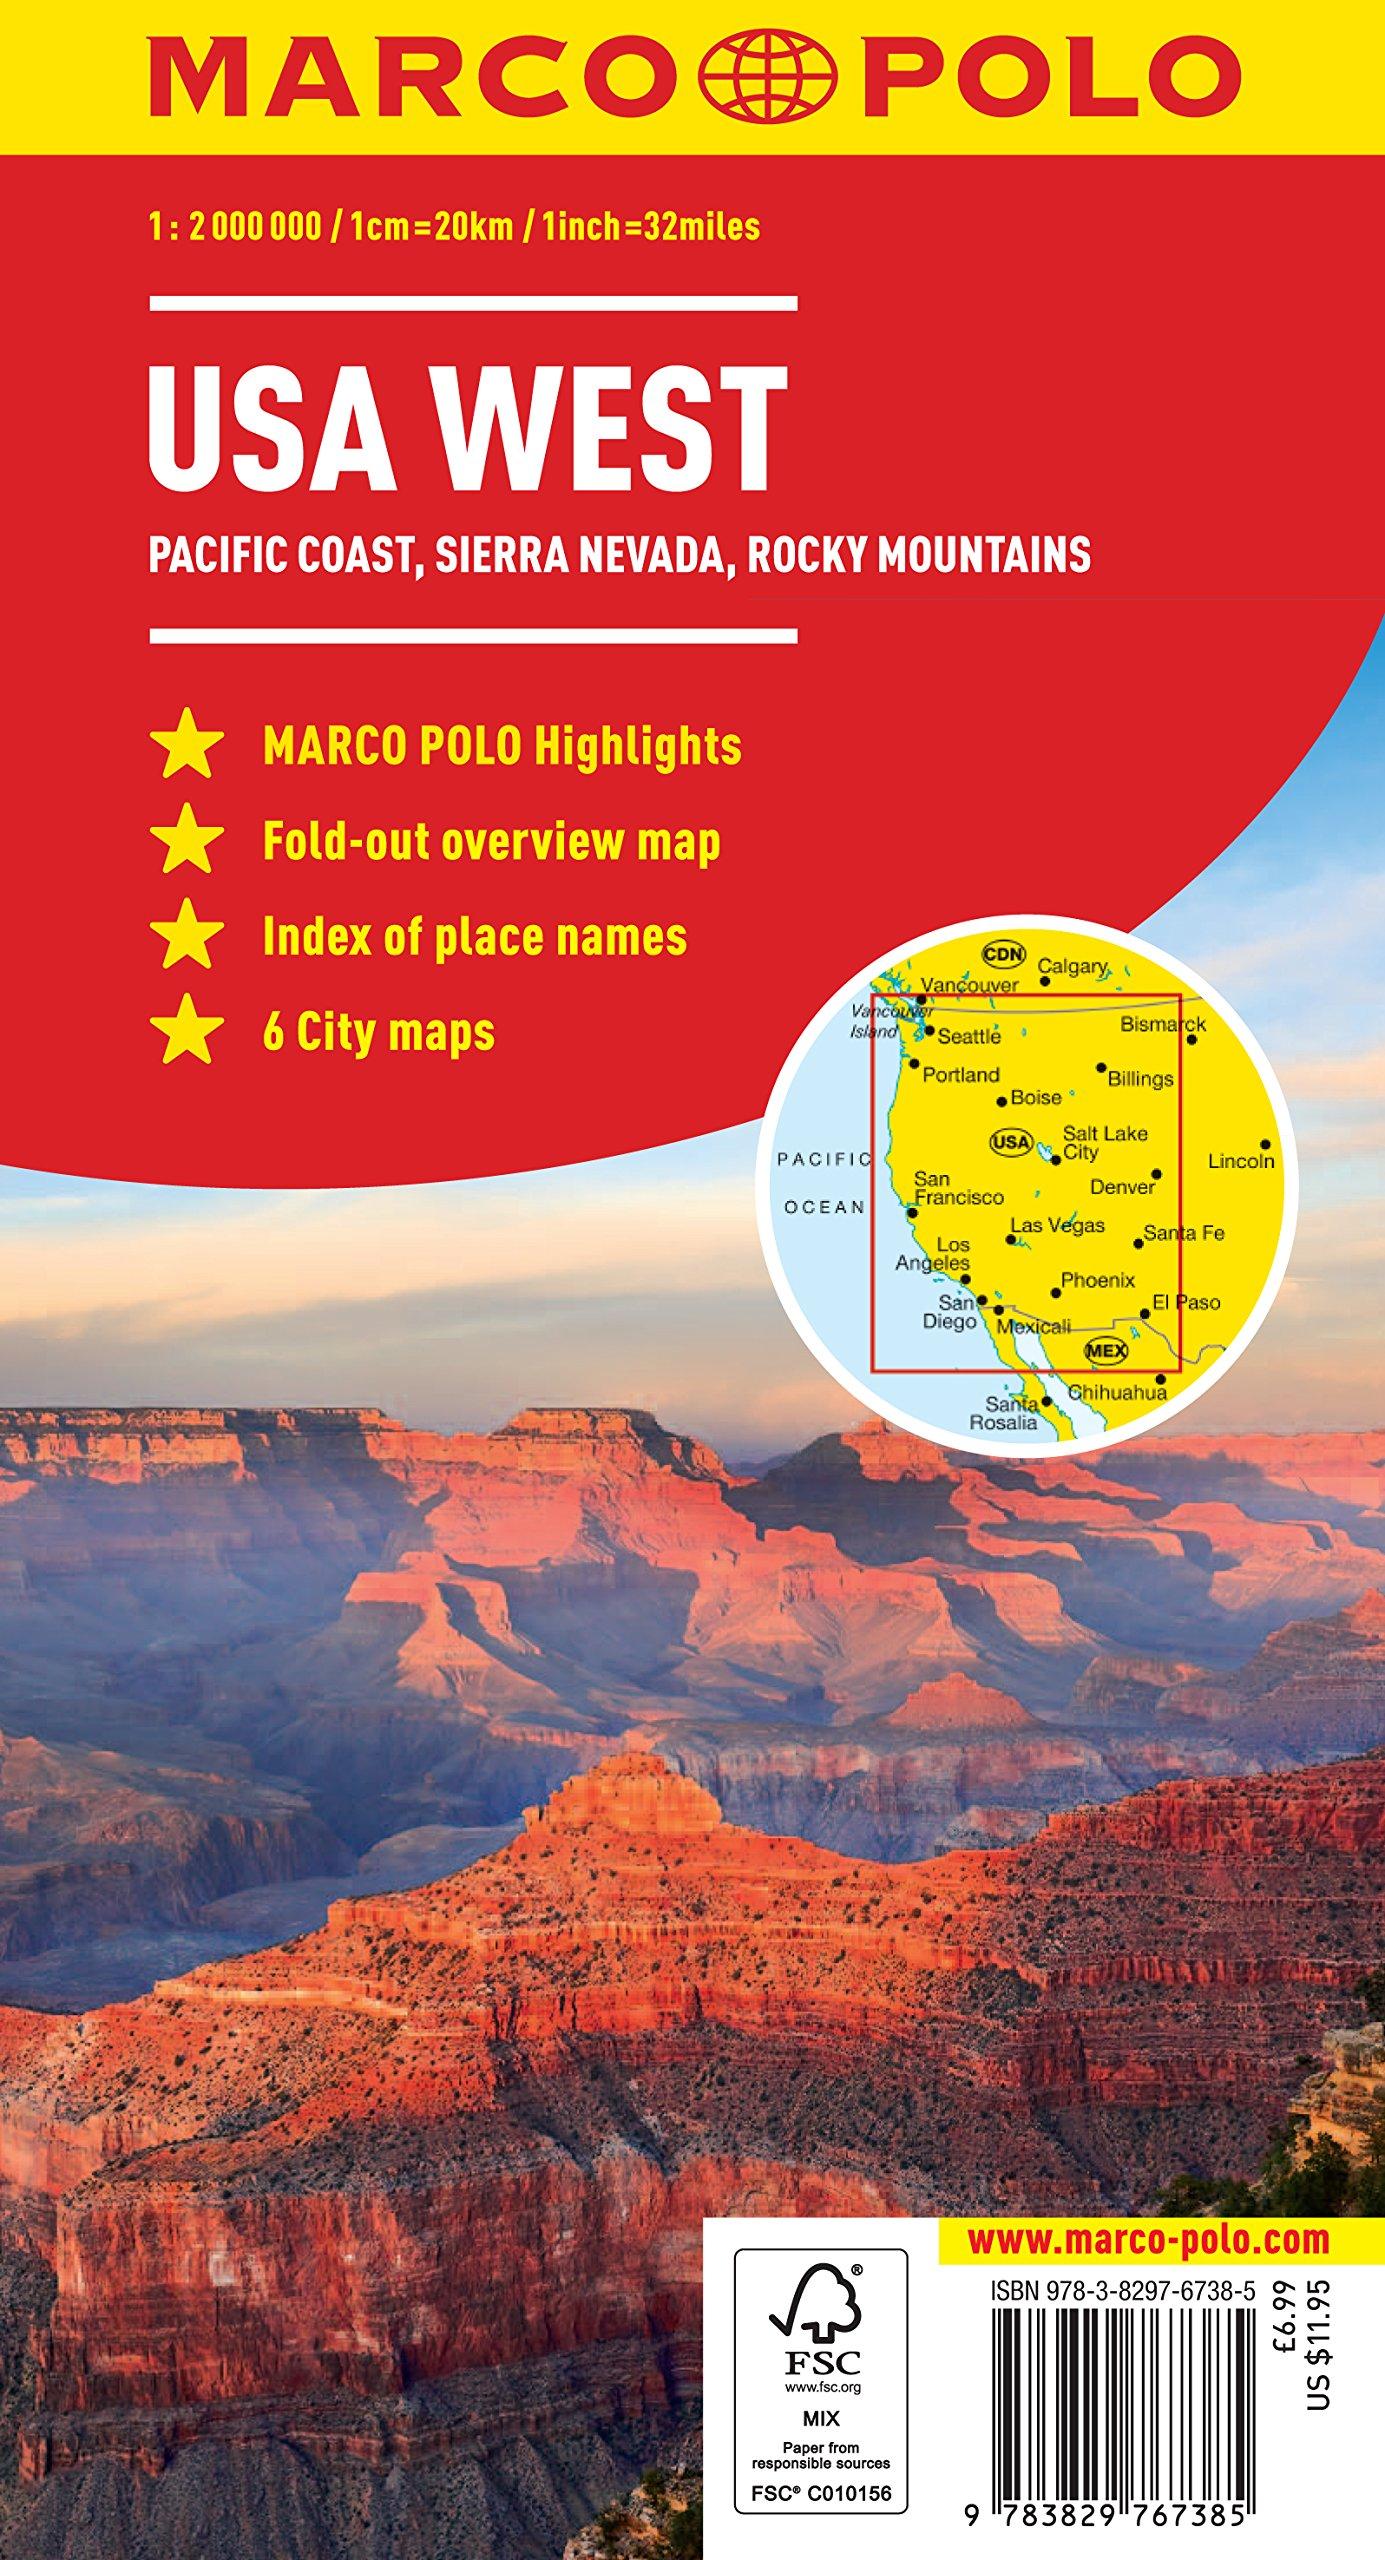 Cartina Usa West.Usa West Marco Polo Map Marco Polo Maps Marco Polo Travel Publishing 9783829767385 Amazon Com Books